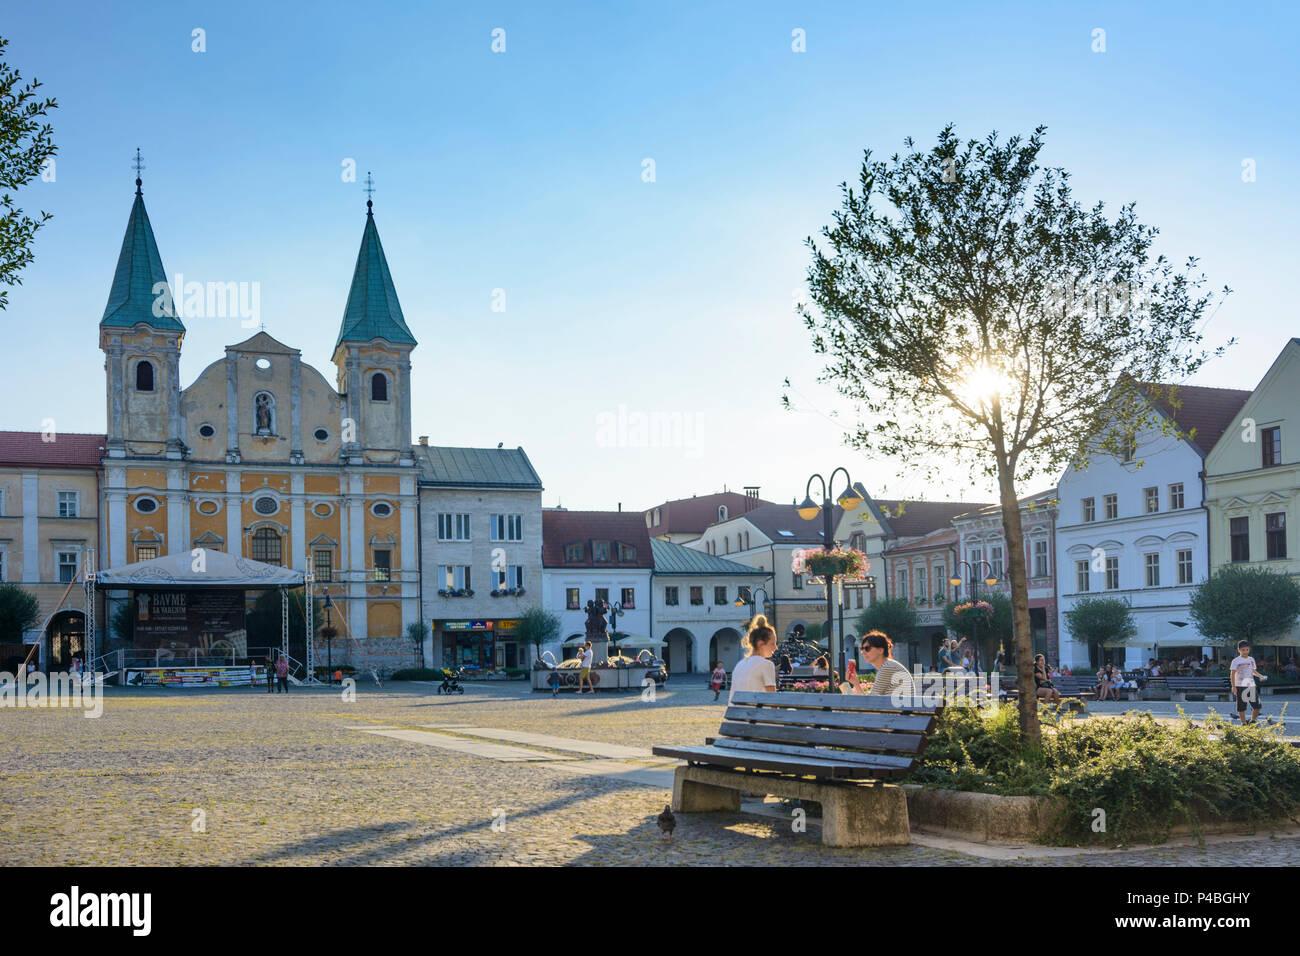 Zilina (Sillein, Silein), main square Marianske namestie, Saint Paul Church, Slovakia - Stock Image